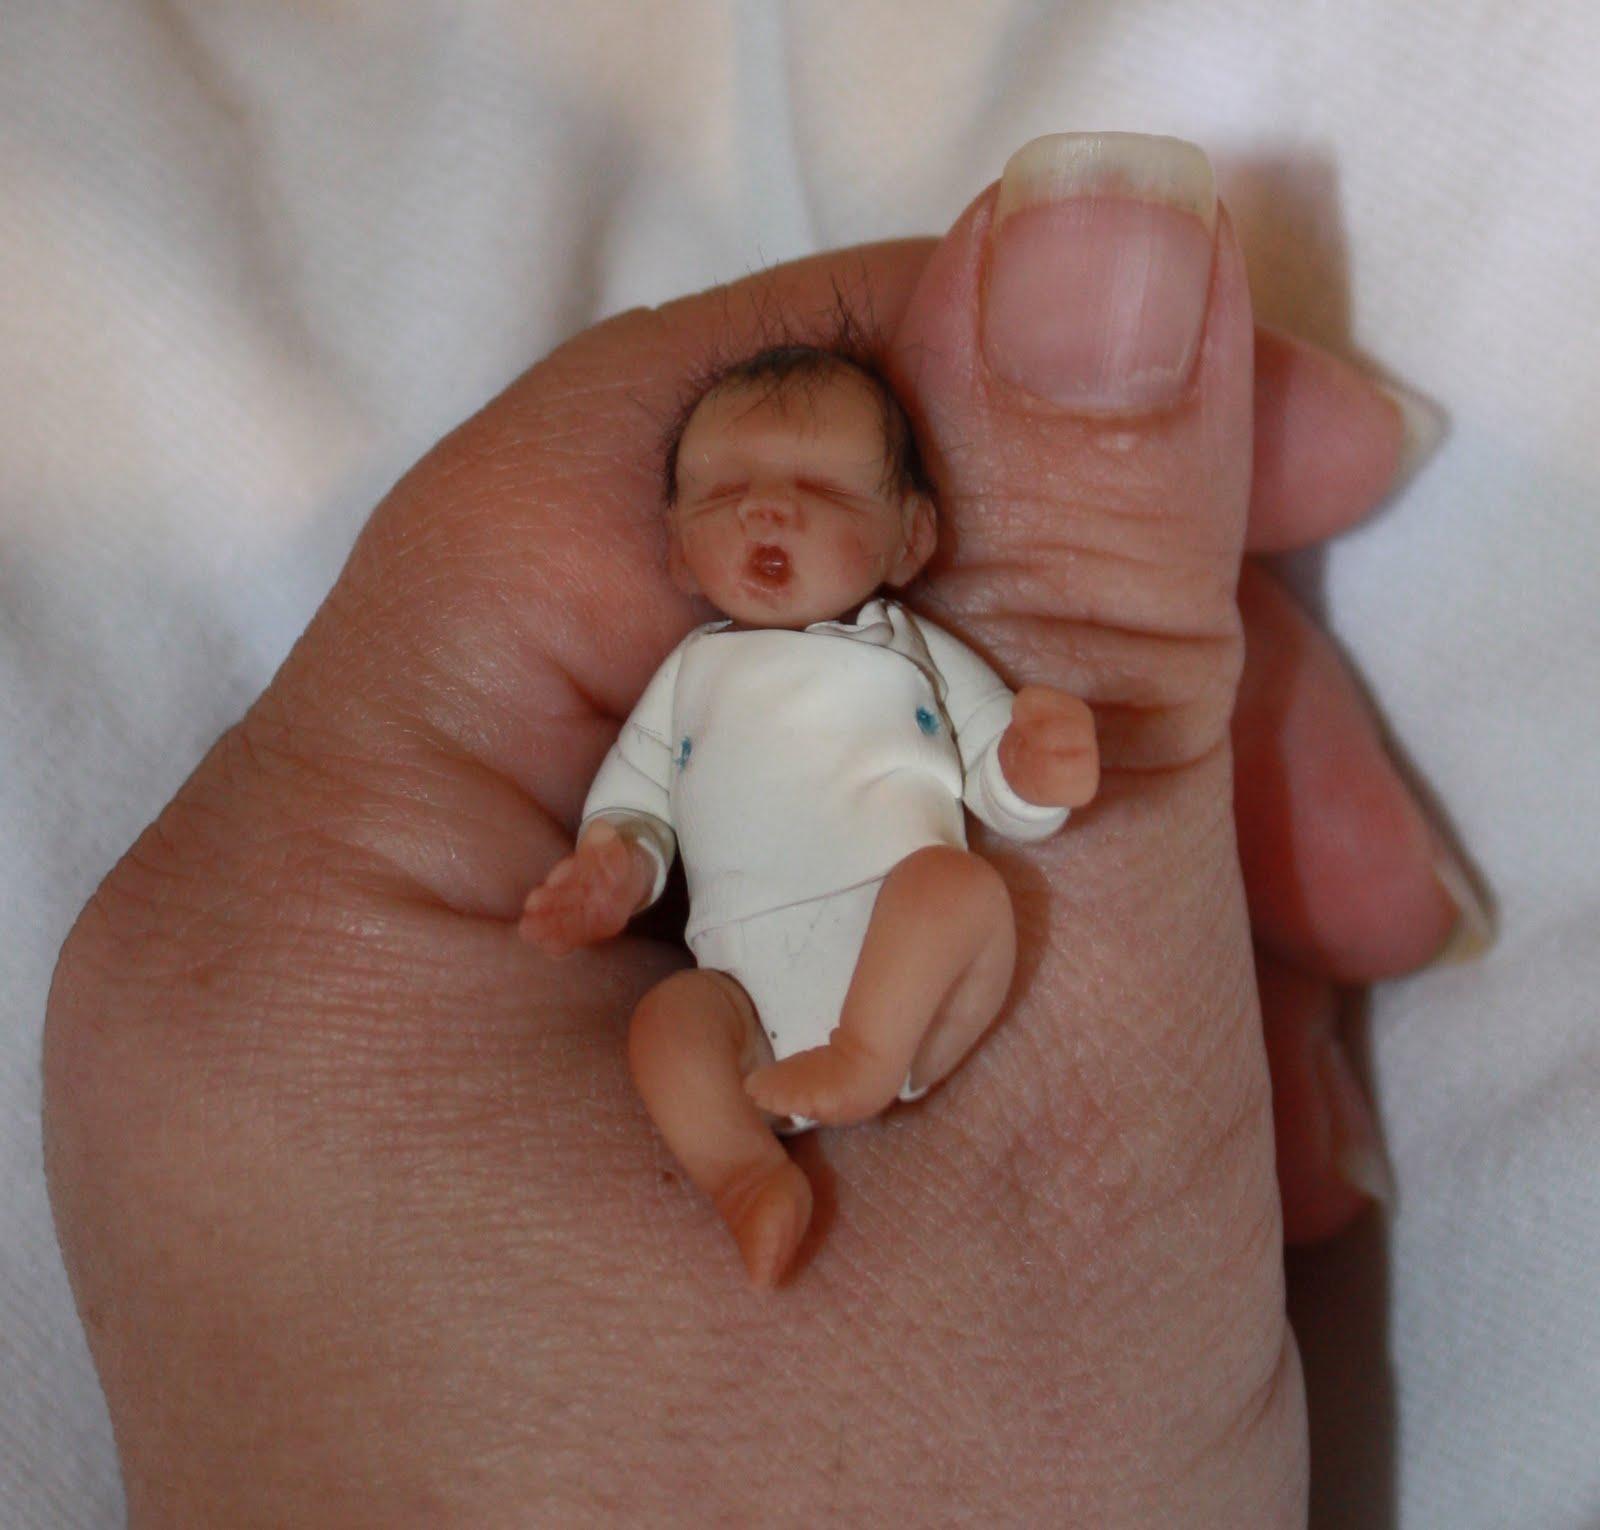 Bright Creations Original Dolls: I love extra tiny babies